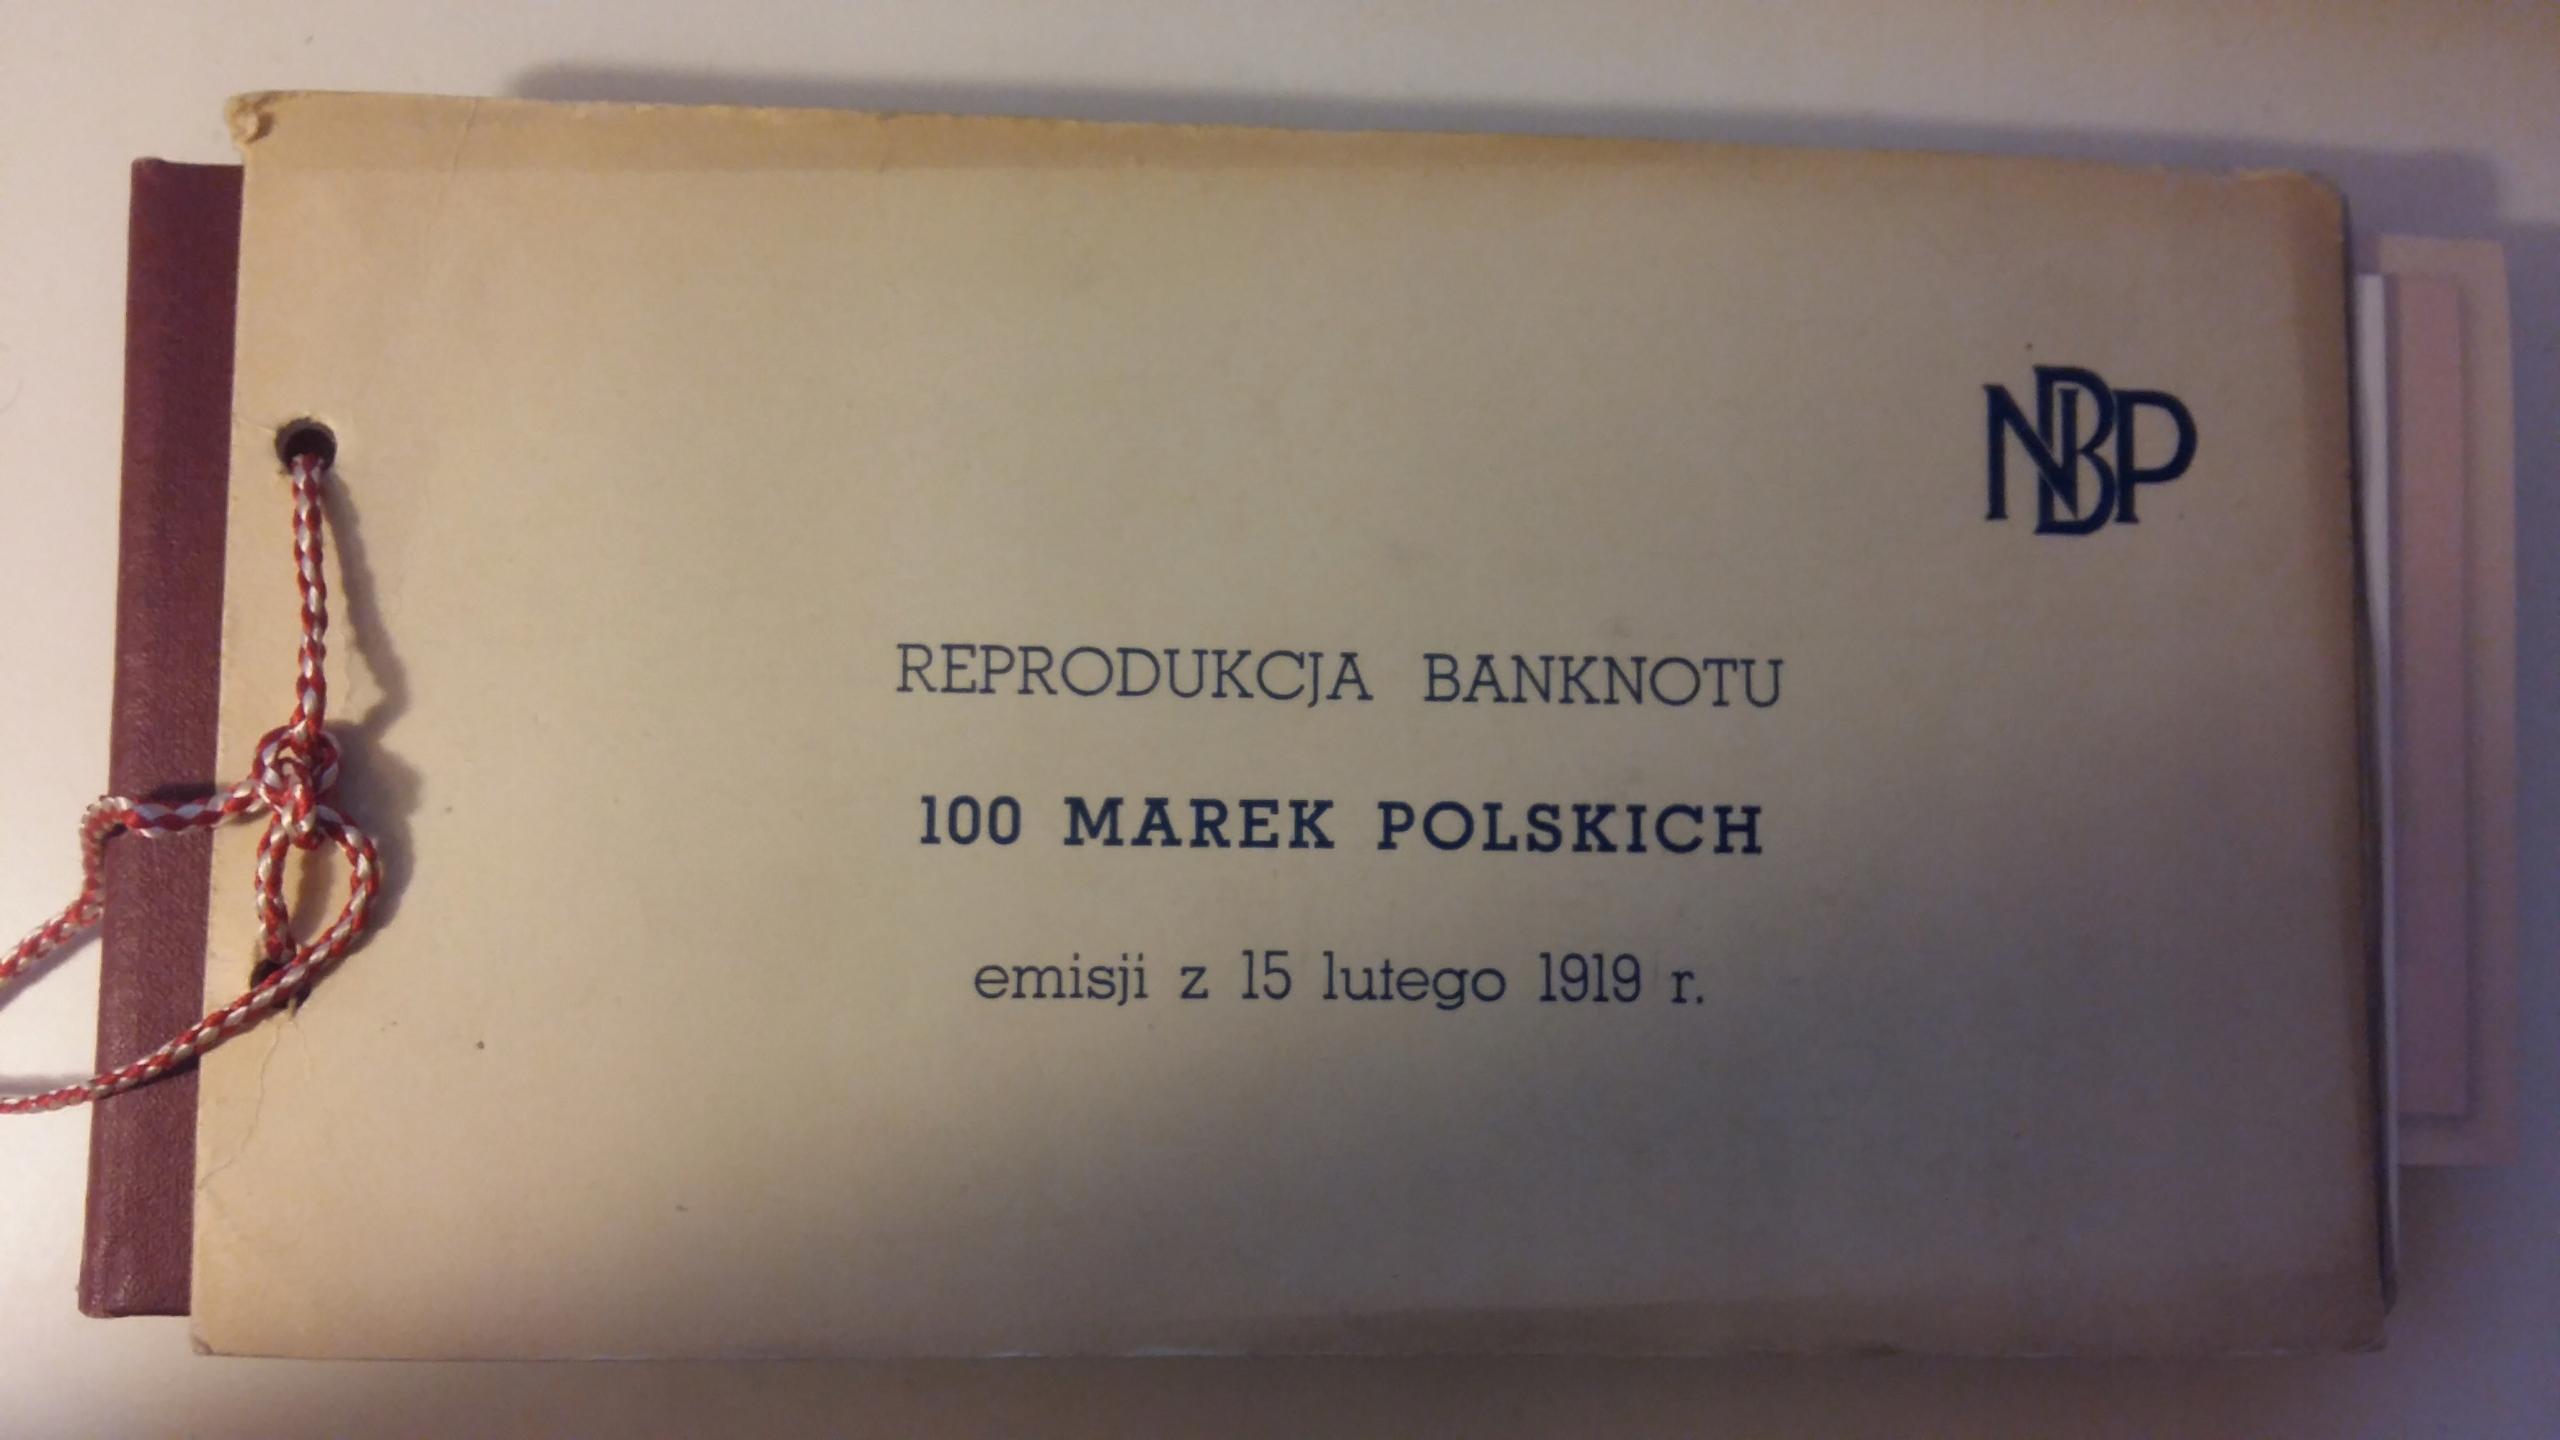 Reprodukcja banknotu 100 Marek Polskich (1919r.)